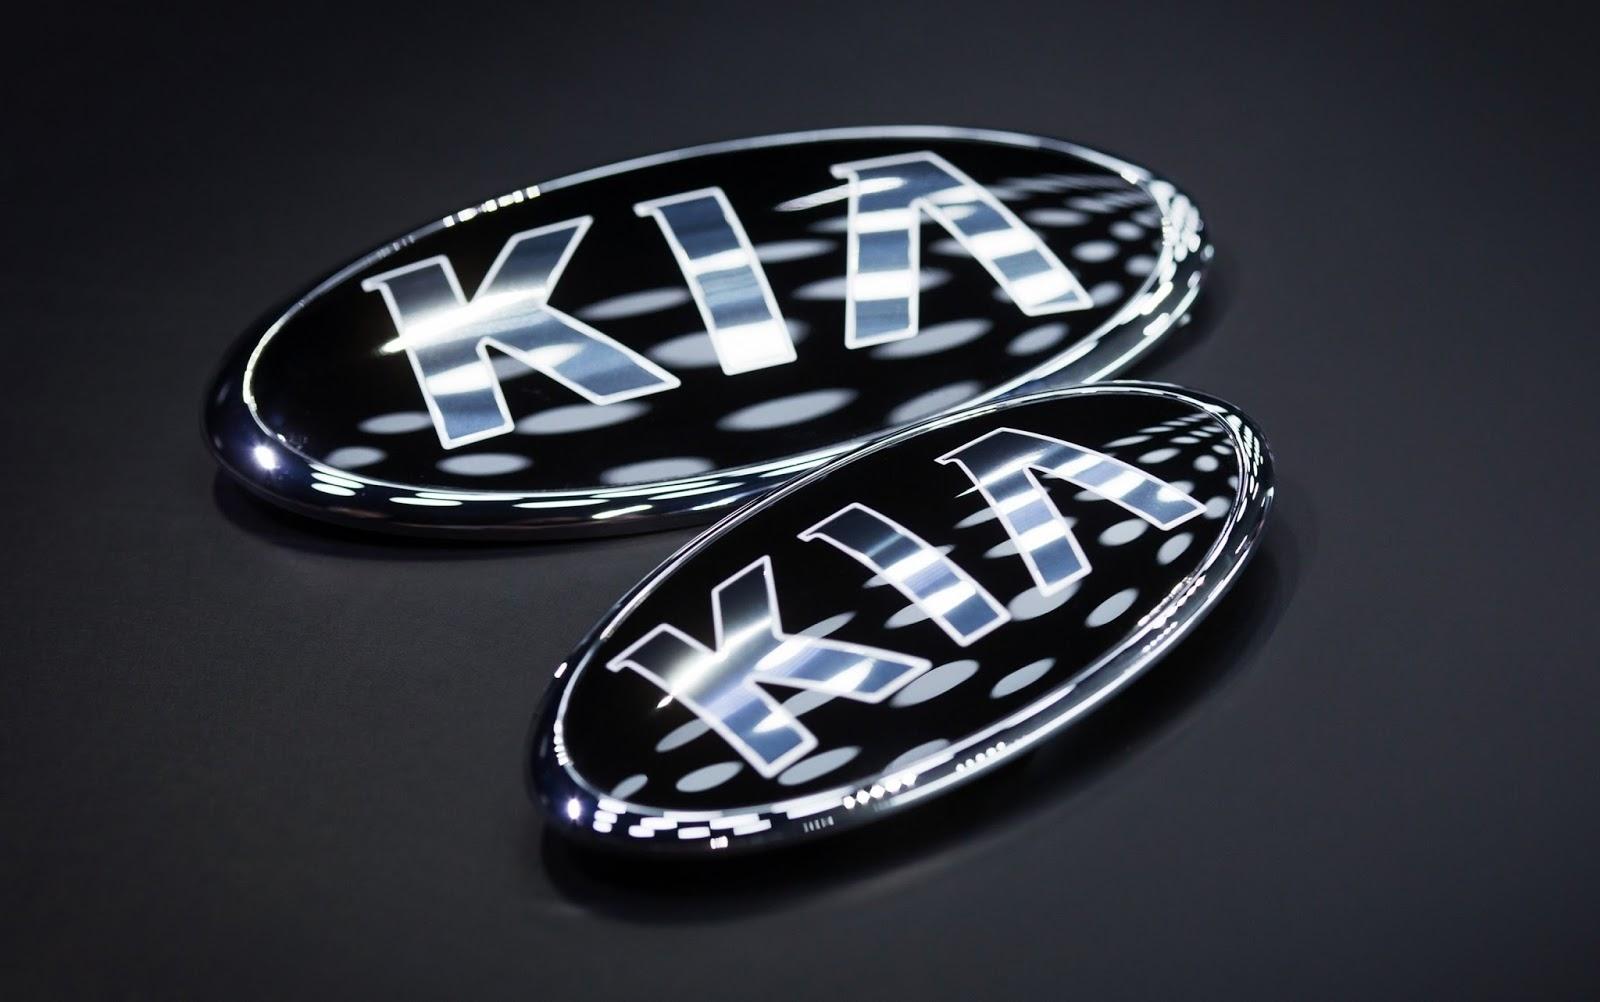 logo front wasatch utah new history wasatchfrontkia ogden company cutrubus used kia cars website